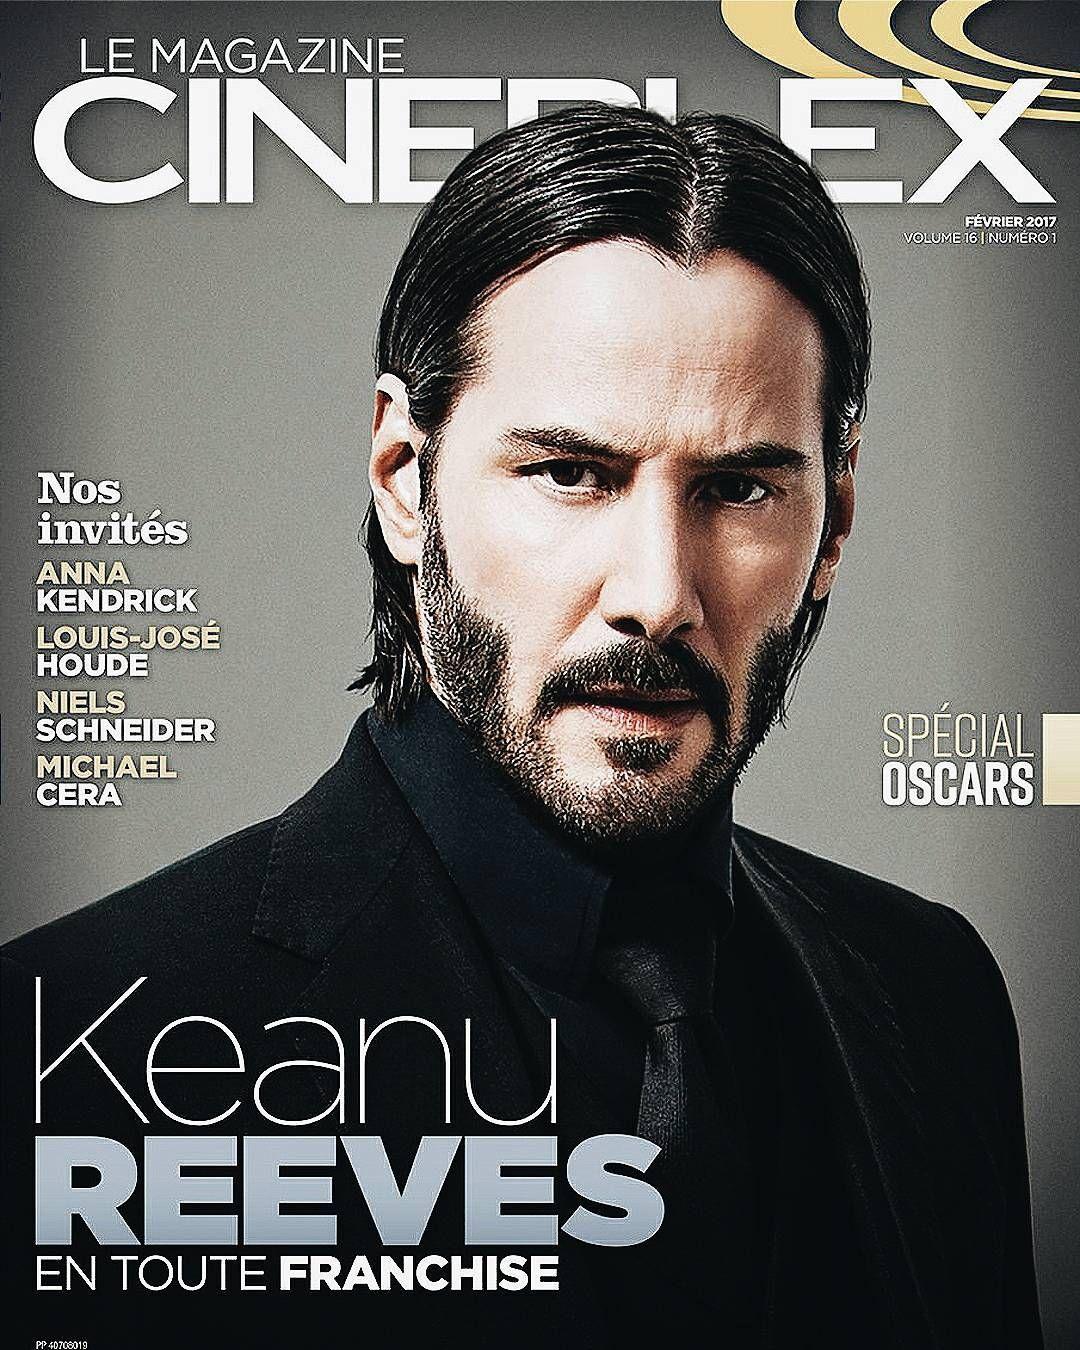 Keanu In Cineplex Magazine For John Wick Chapter Two Keanureeves Cineplexmagazine Keanu Reeves Keanu Reeves John Wick Keanu Reeves Quotes